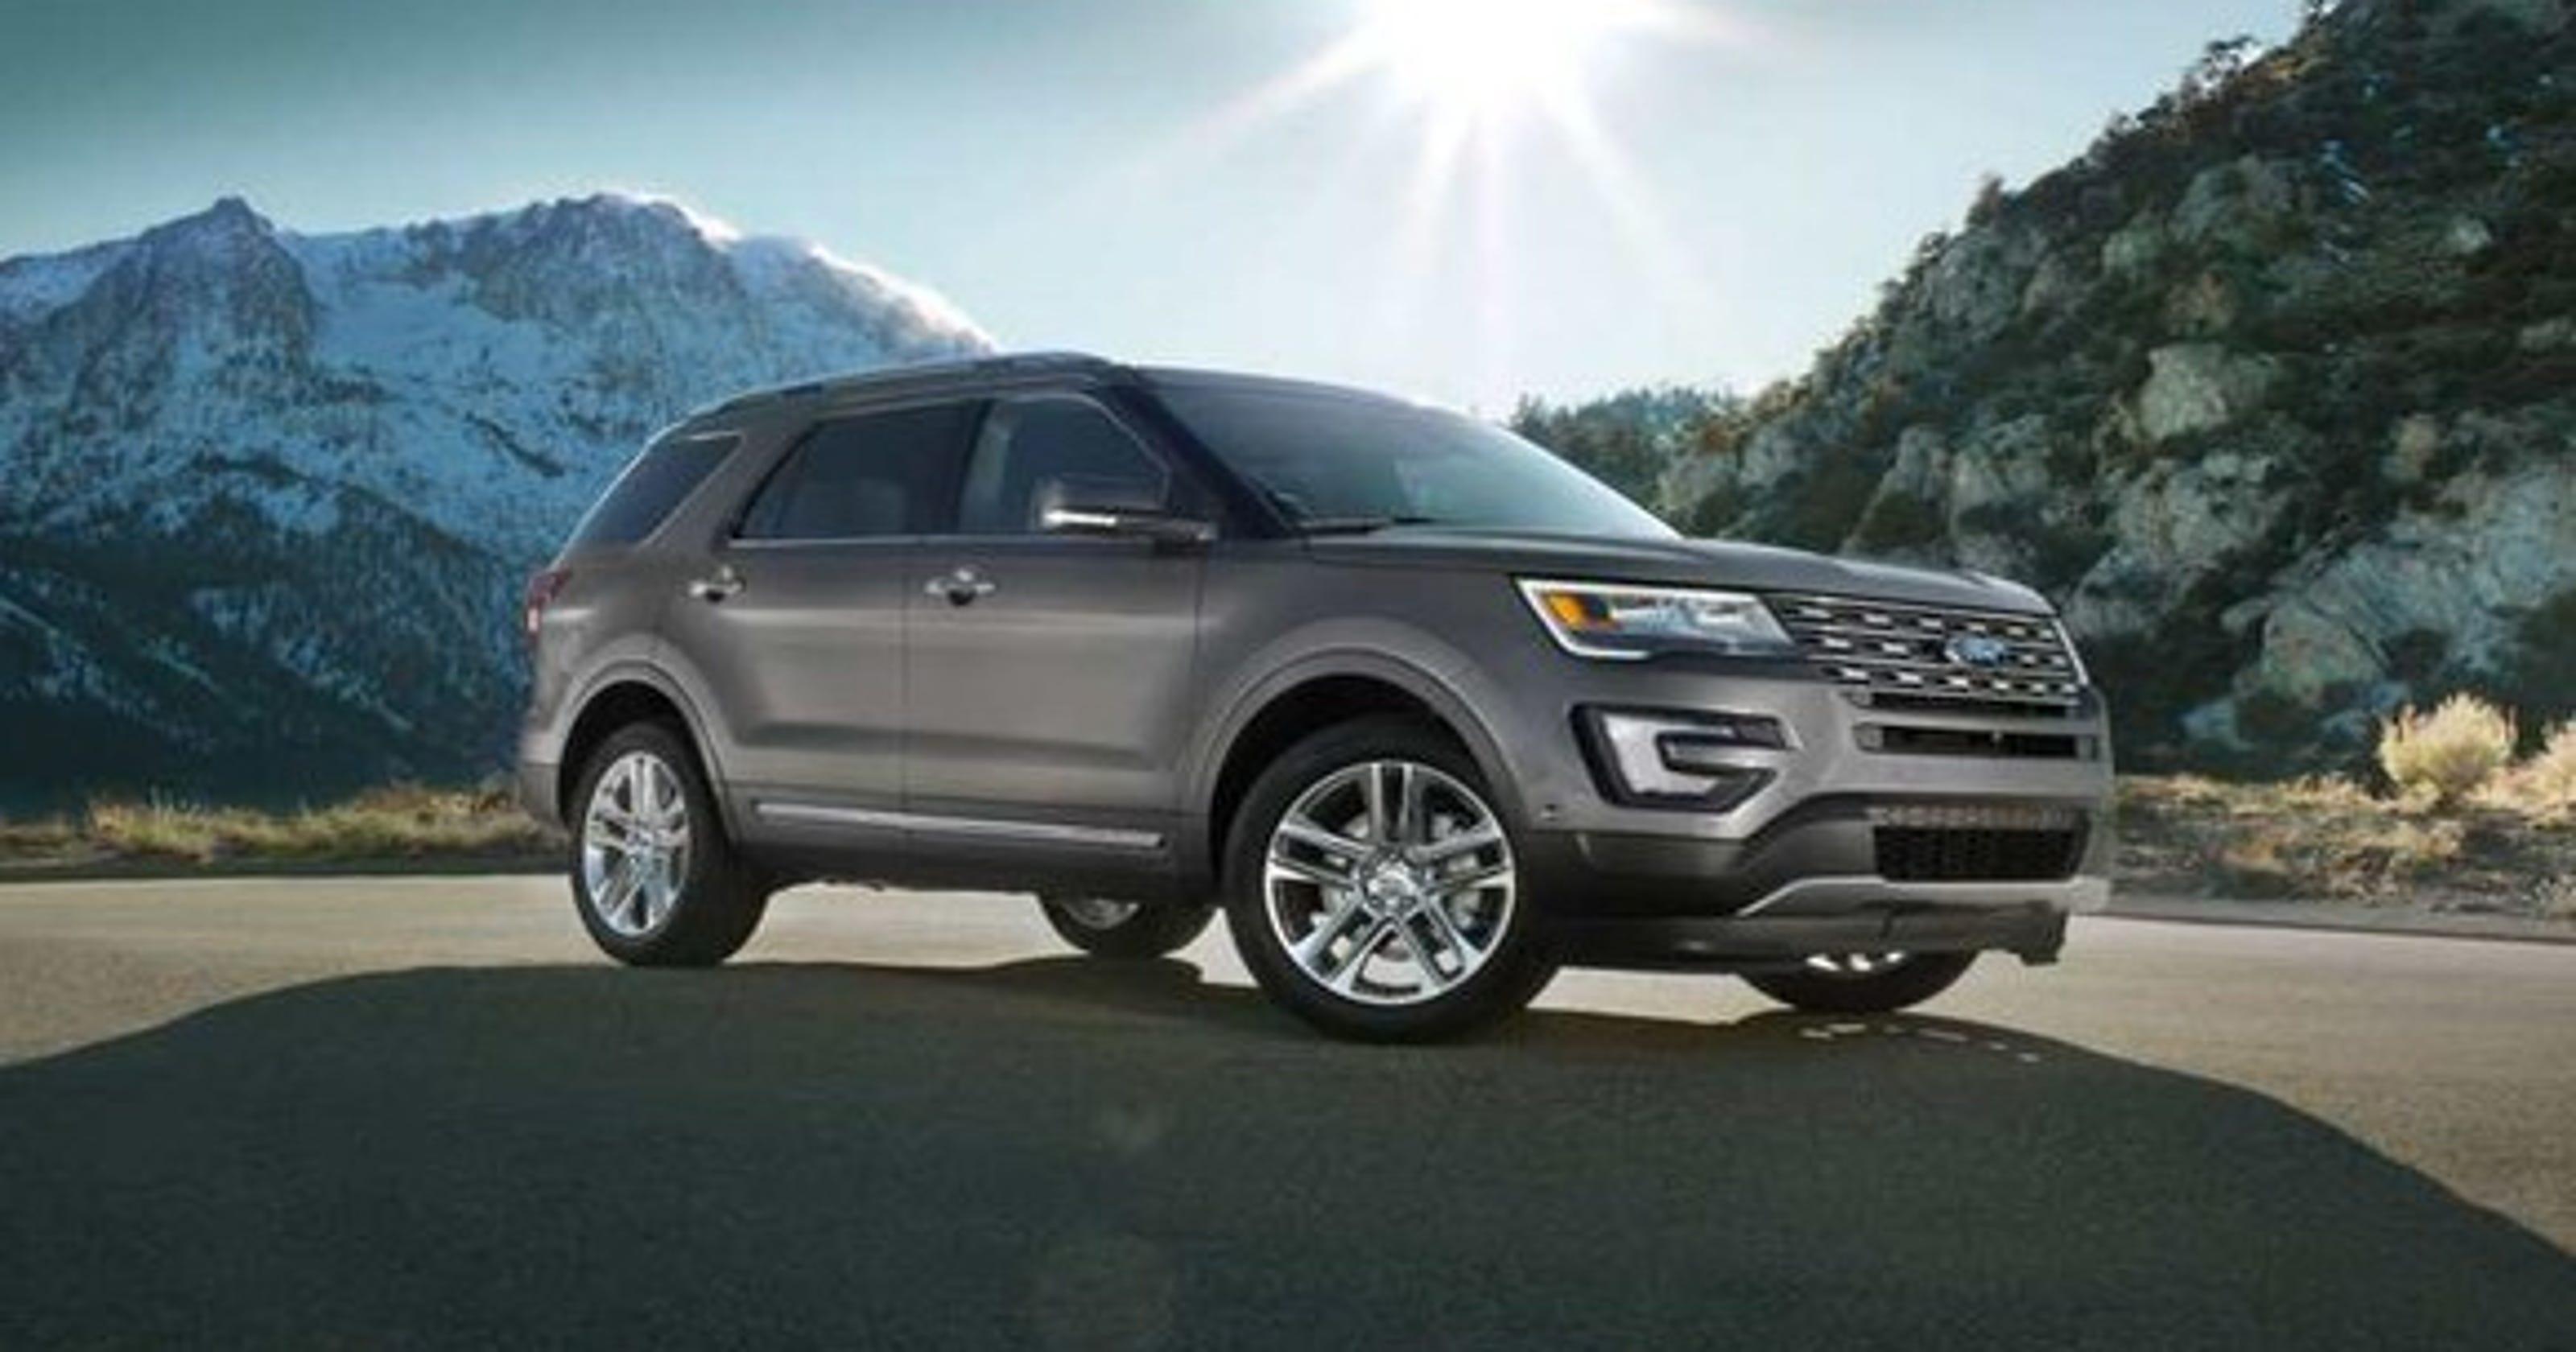 Ford recalls 1 2M Explorer SUVs, 123,000 F-150 pickups to